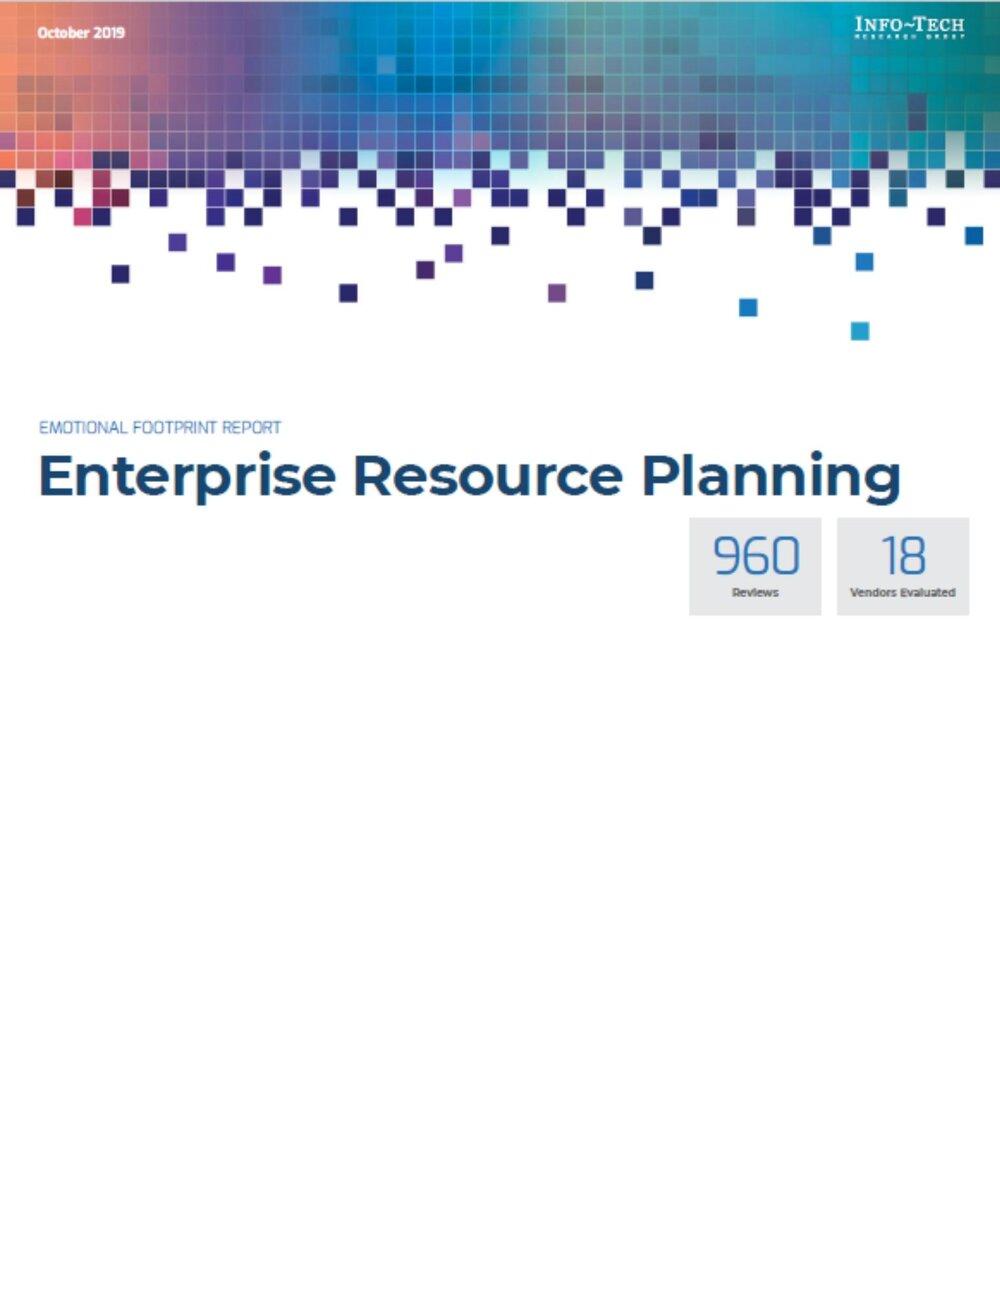 Emotional Footprint Report: Enterprise Resource Planning